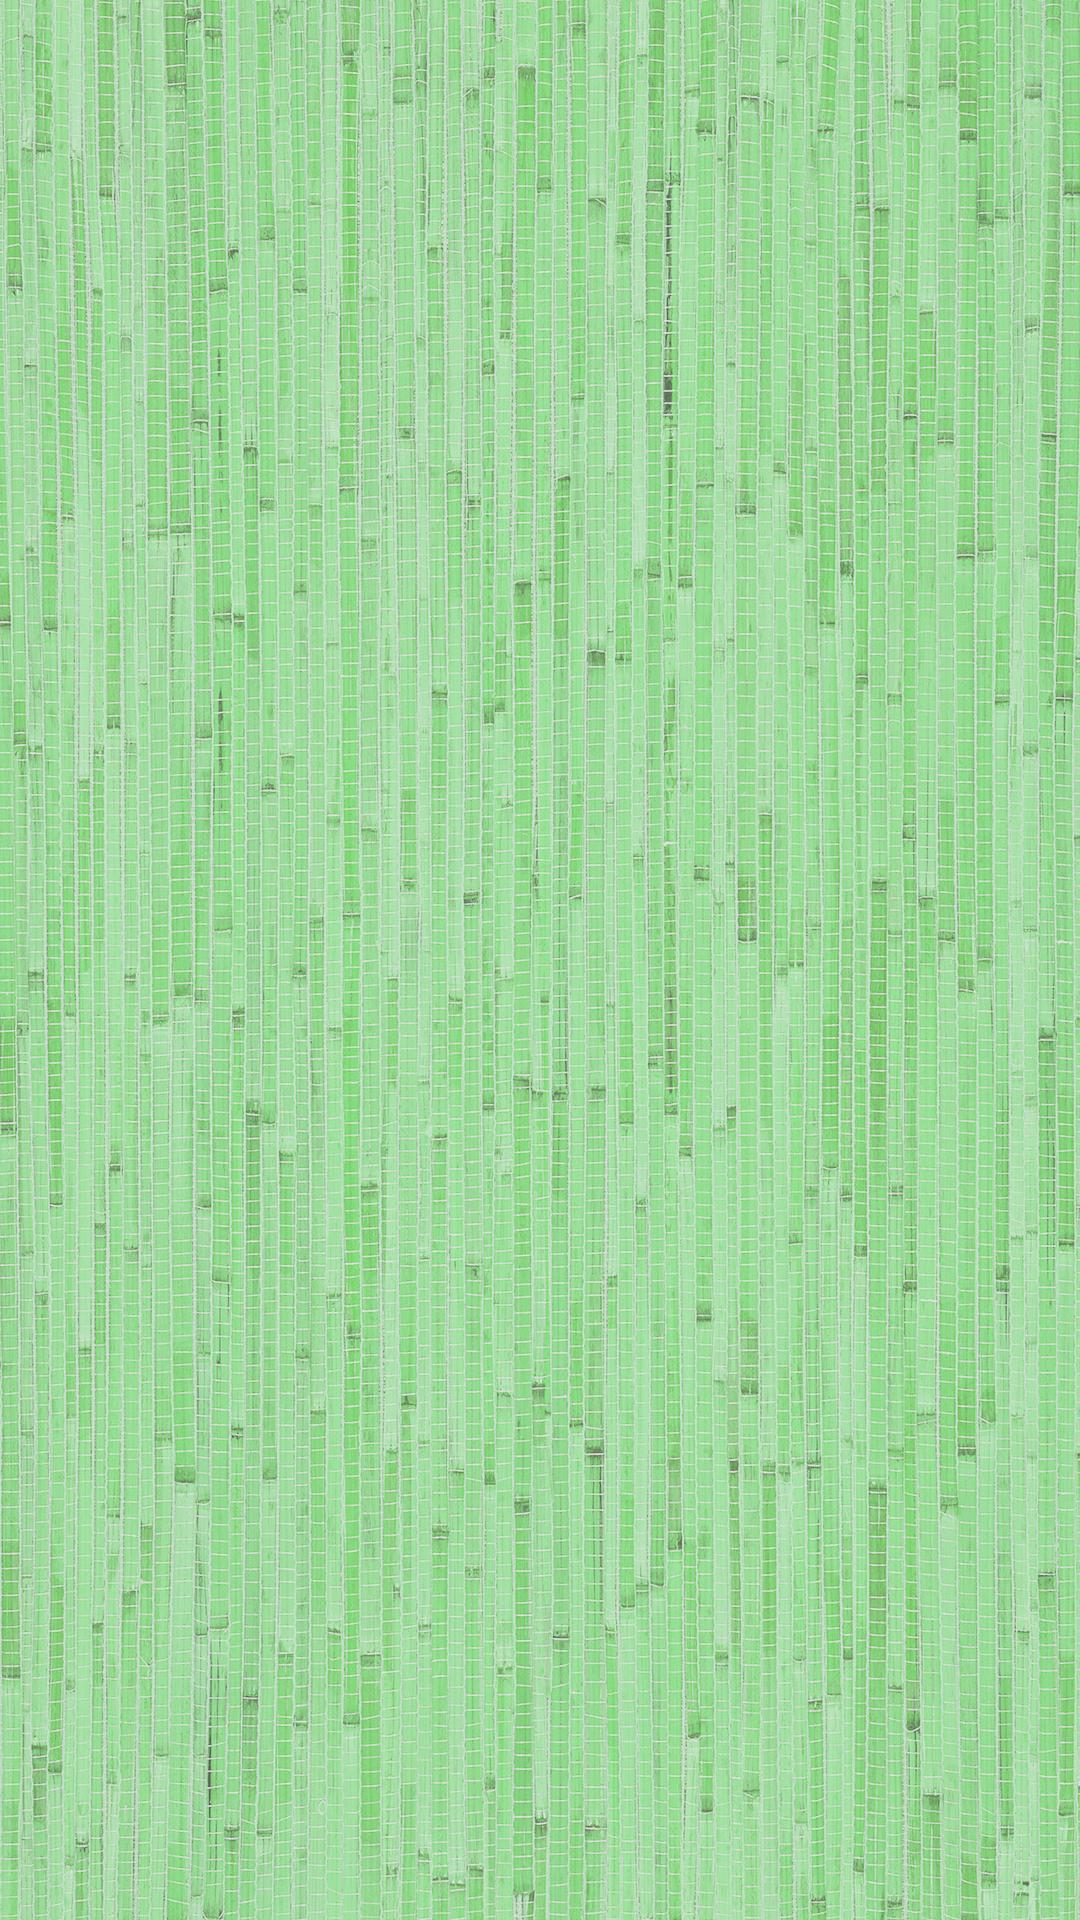 Tekstur Kayu Pola Hijau Wallpaper Sc Iphone7plus